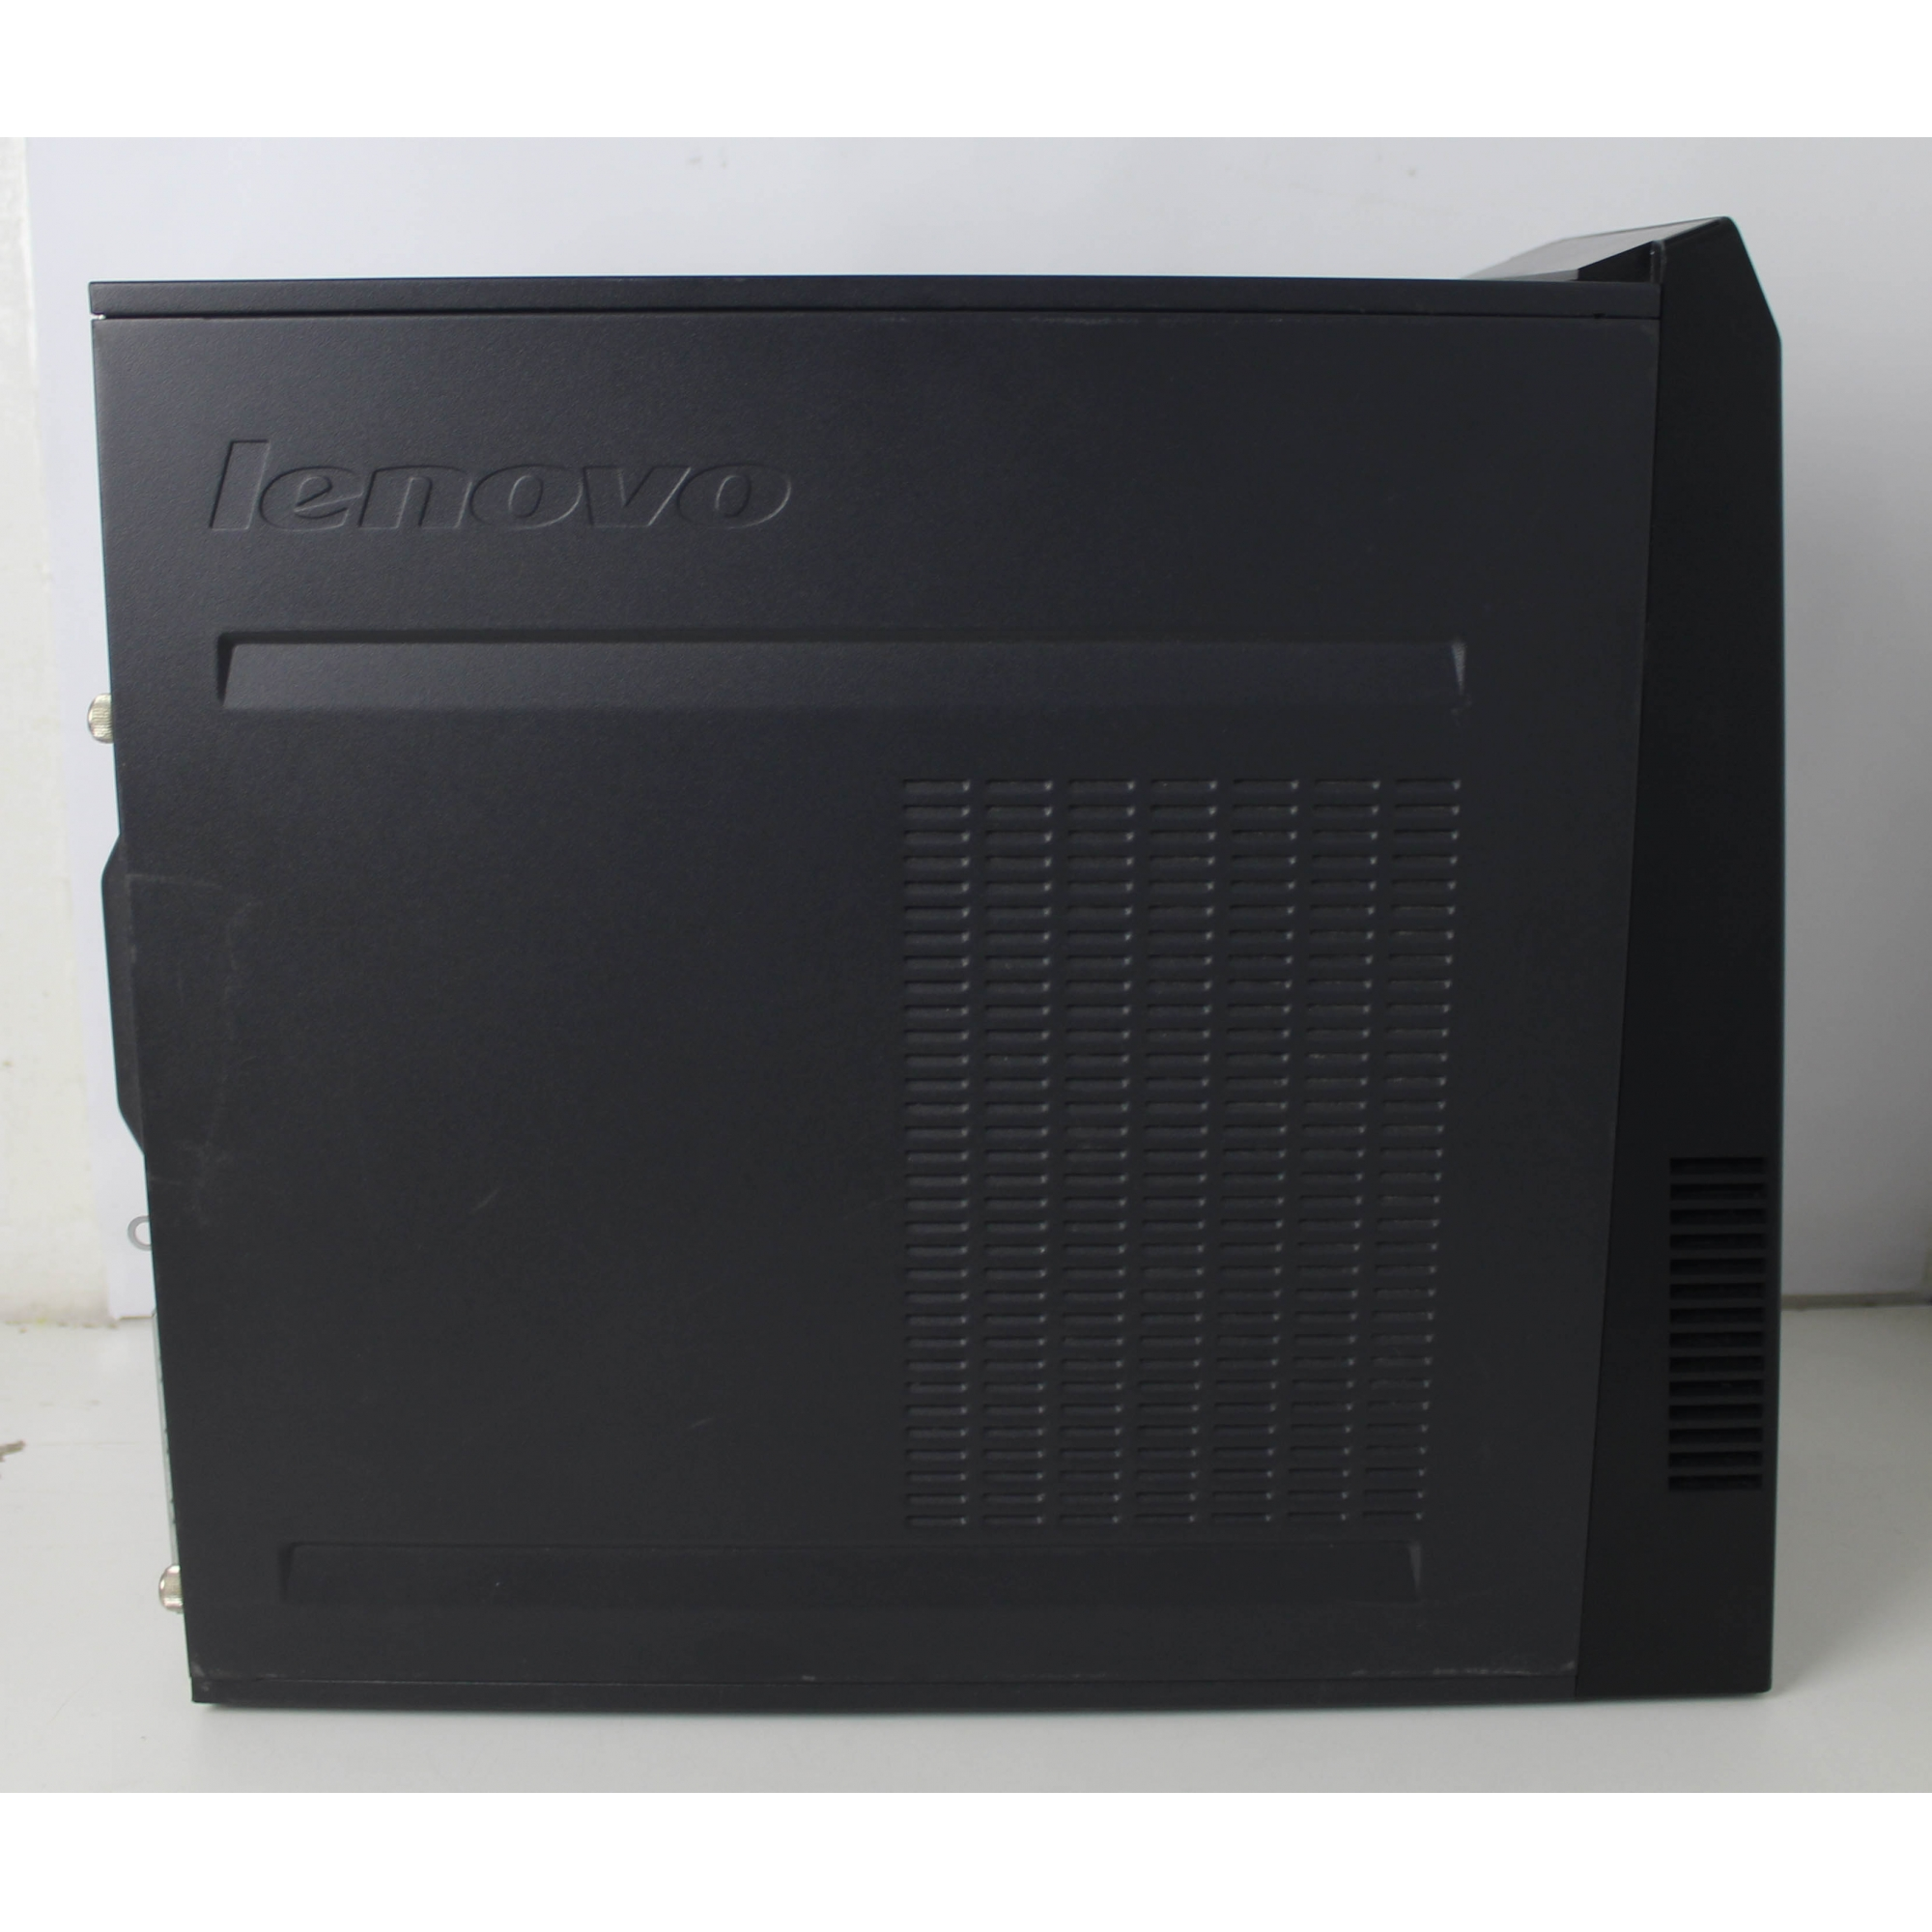 30 UNIDADES - CPU LENOVO 63 INTEL CORE I3 3.4GHZ 4GB HD-500GB